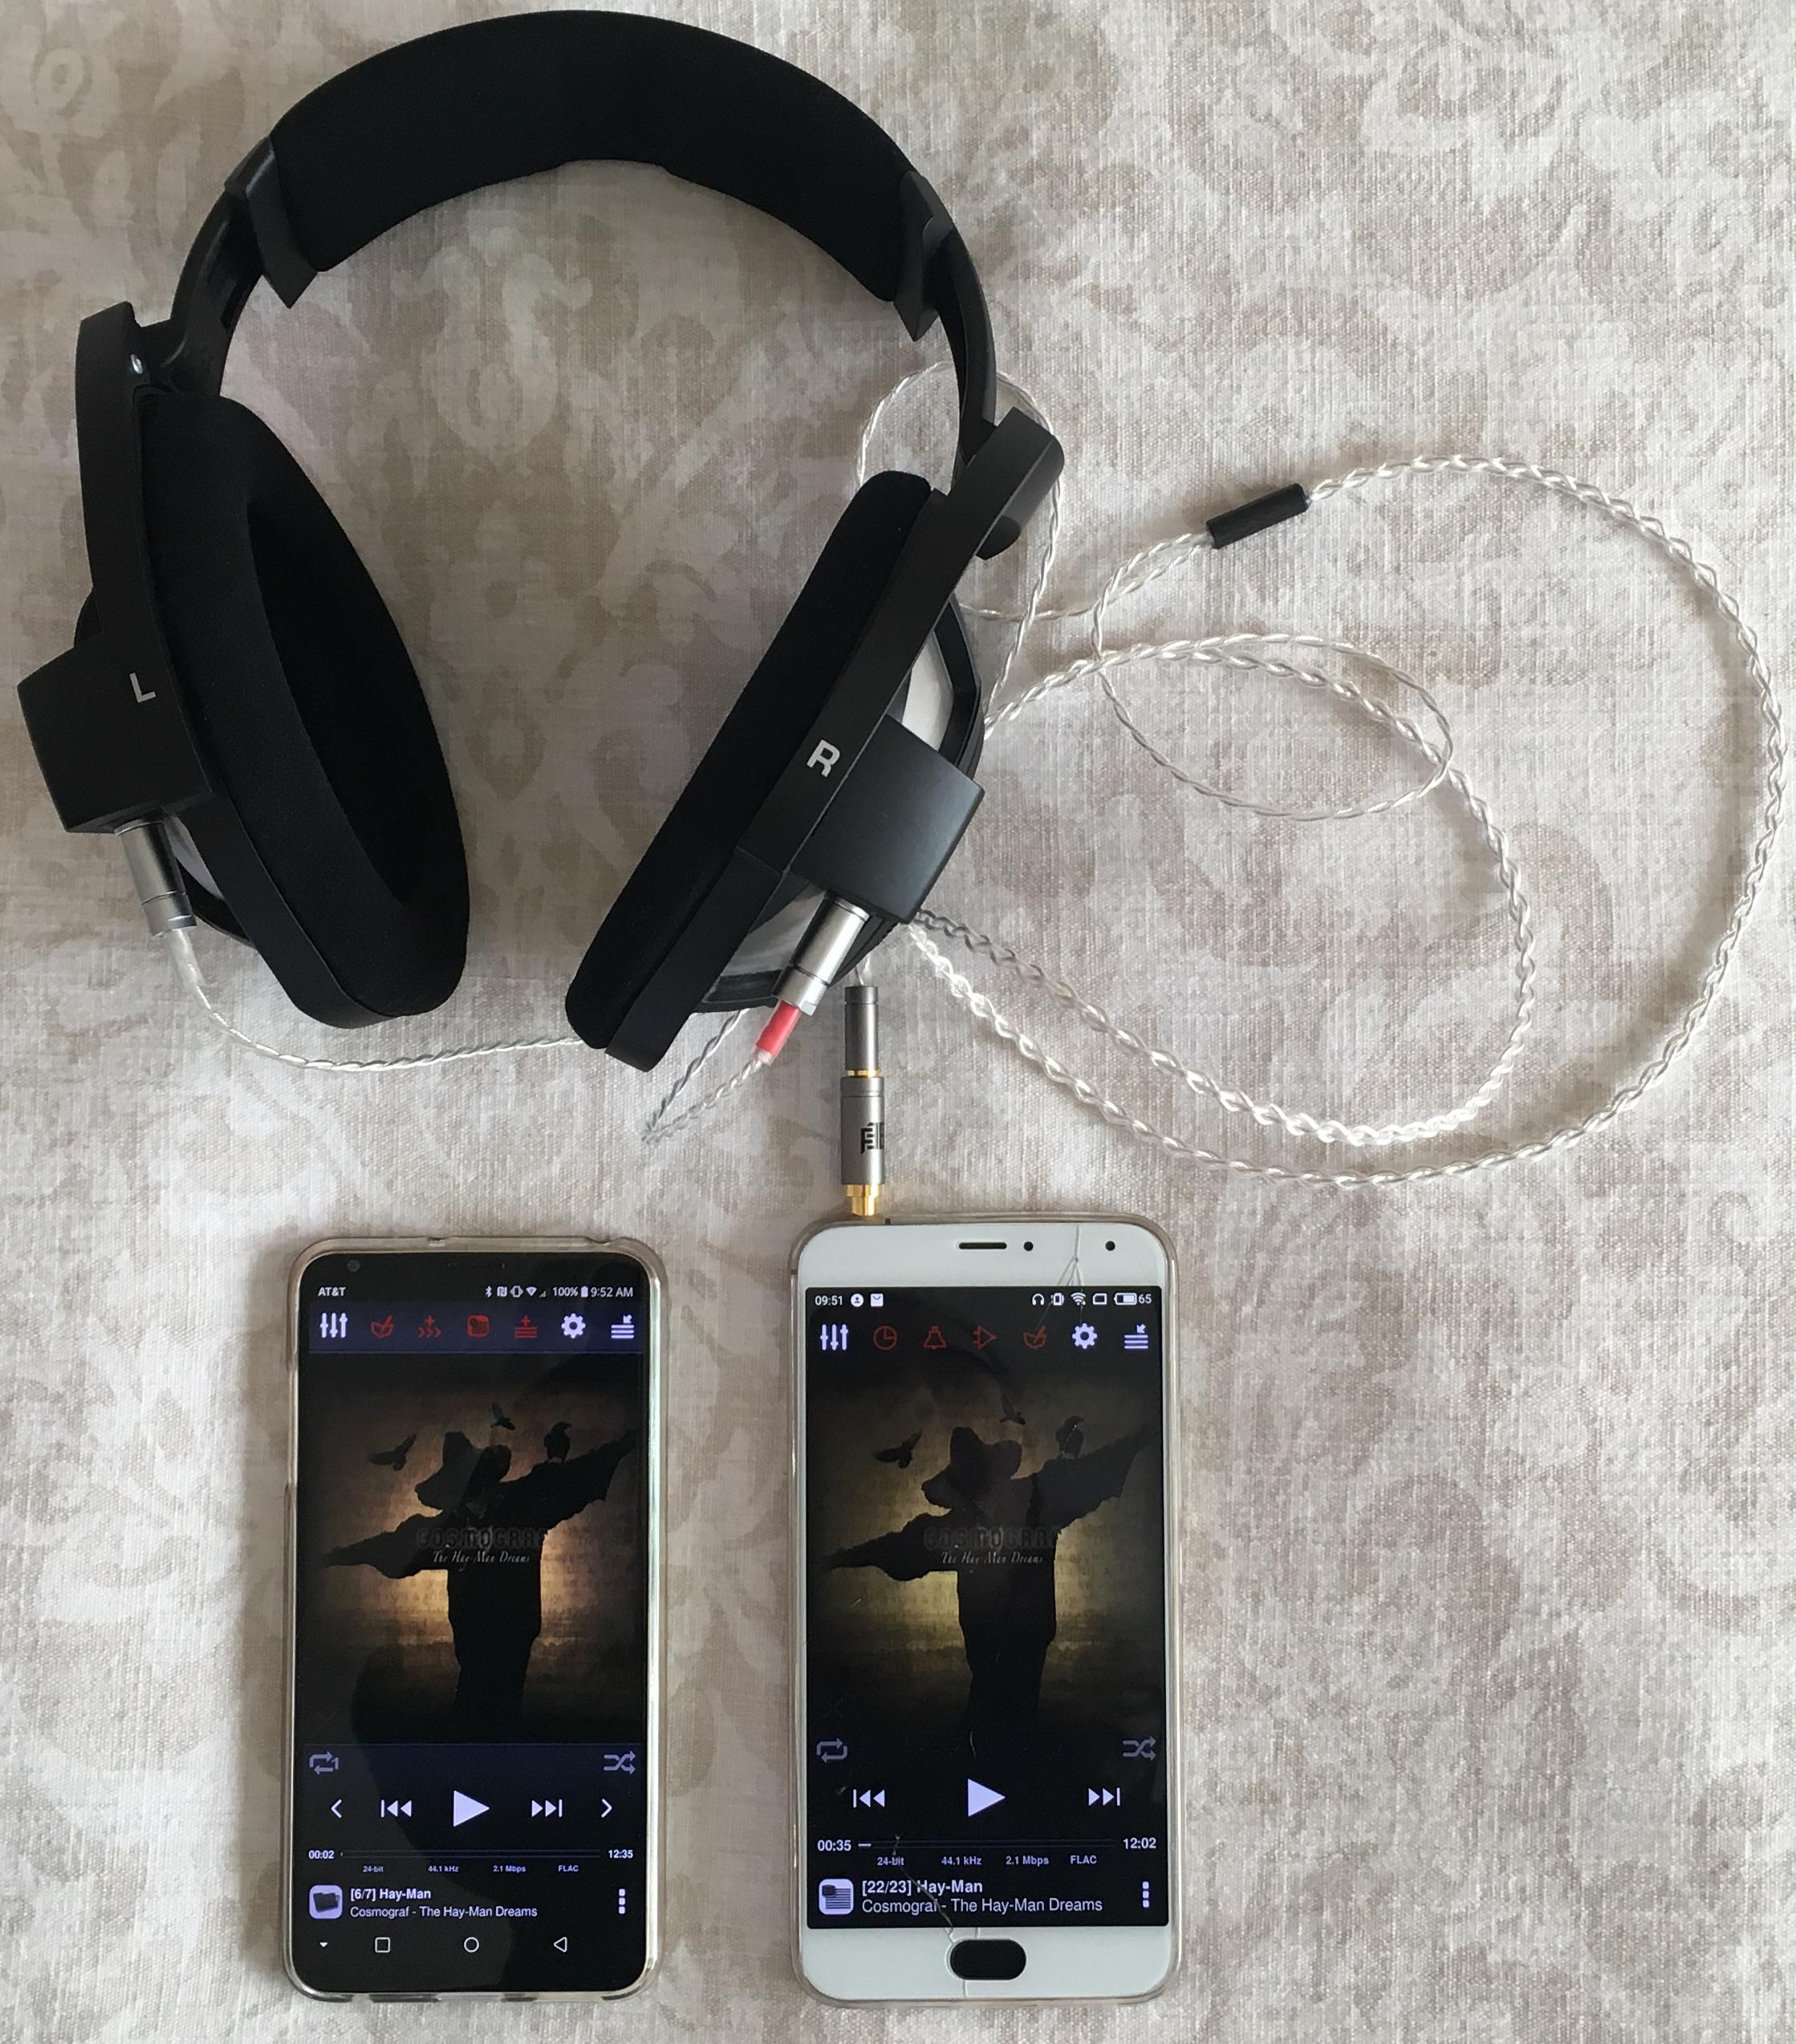 Meizu Pro 5 Smartphone | Headphone Reviews and Discussion - Head-Fi org